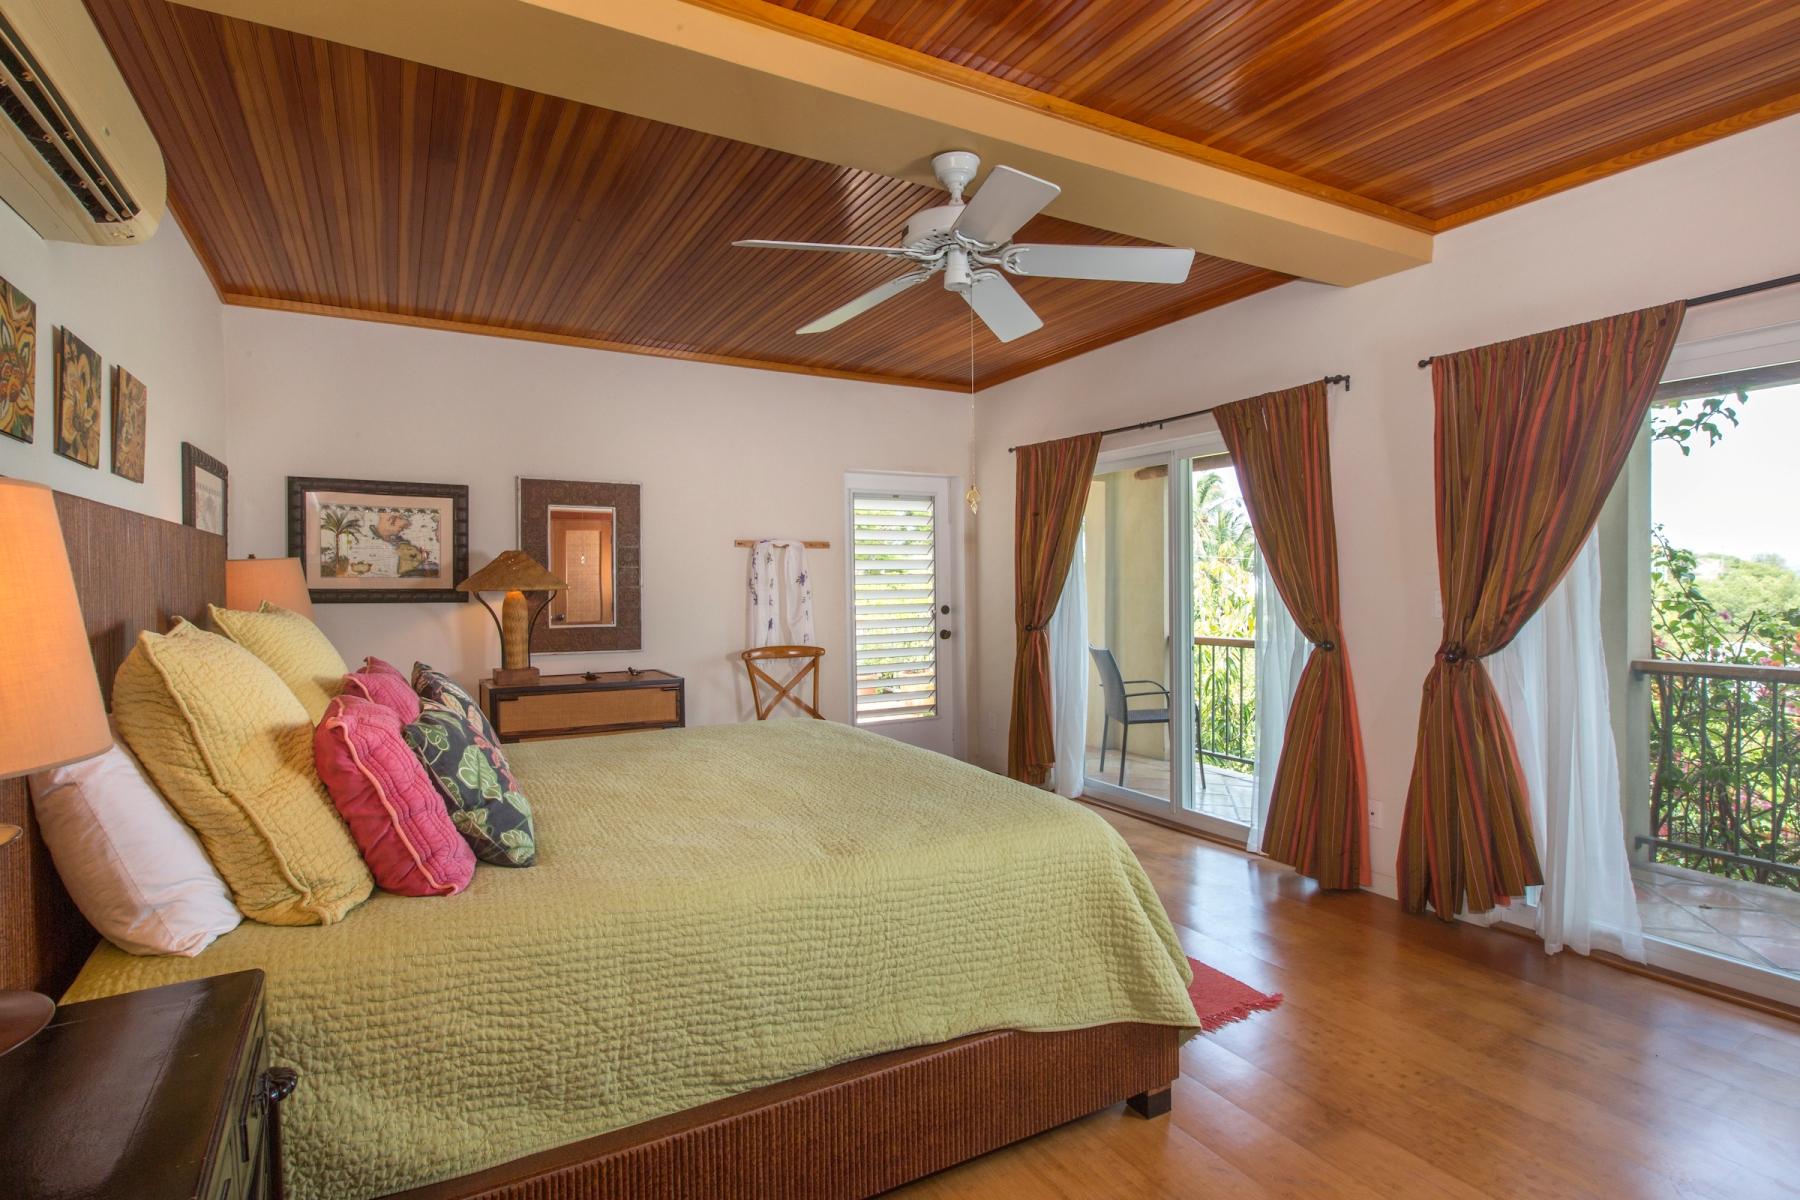 Single Family Home for Sale at El Capitan del Sol 201 Estate Contant & Enighed St John, Virgin Islands 00830 United States Virgin Islands